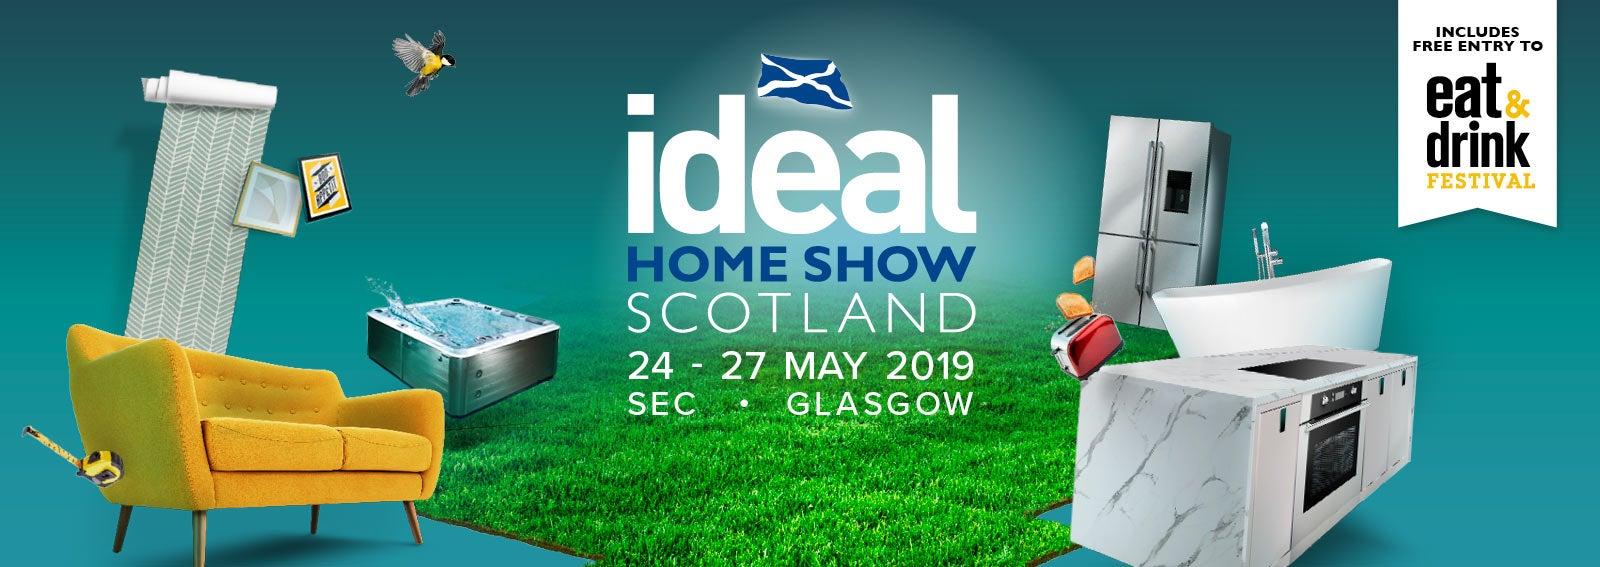 ideal_home_show_scotland_2019_1600x567.jpg